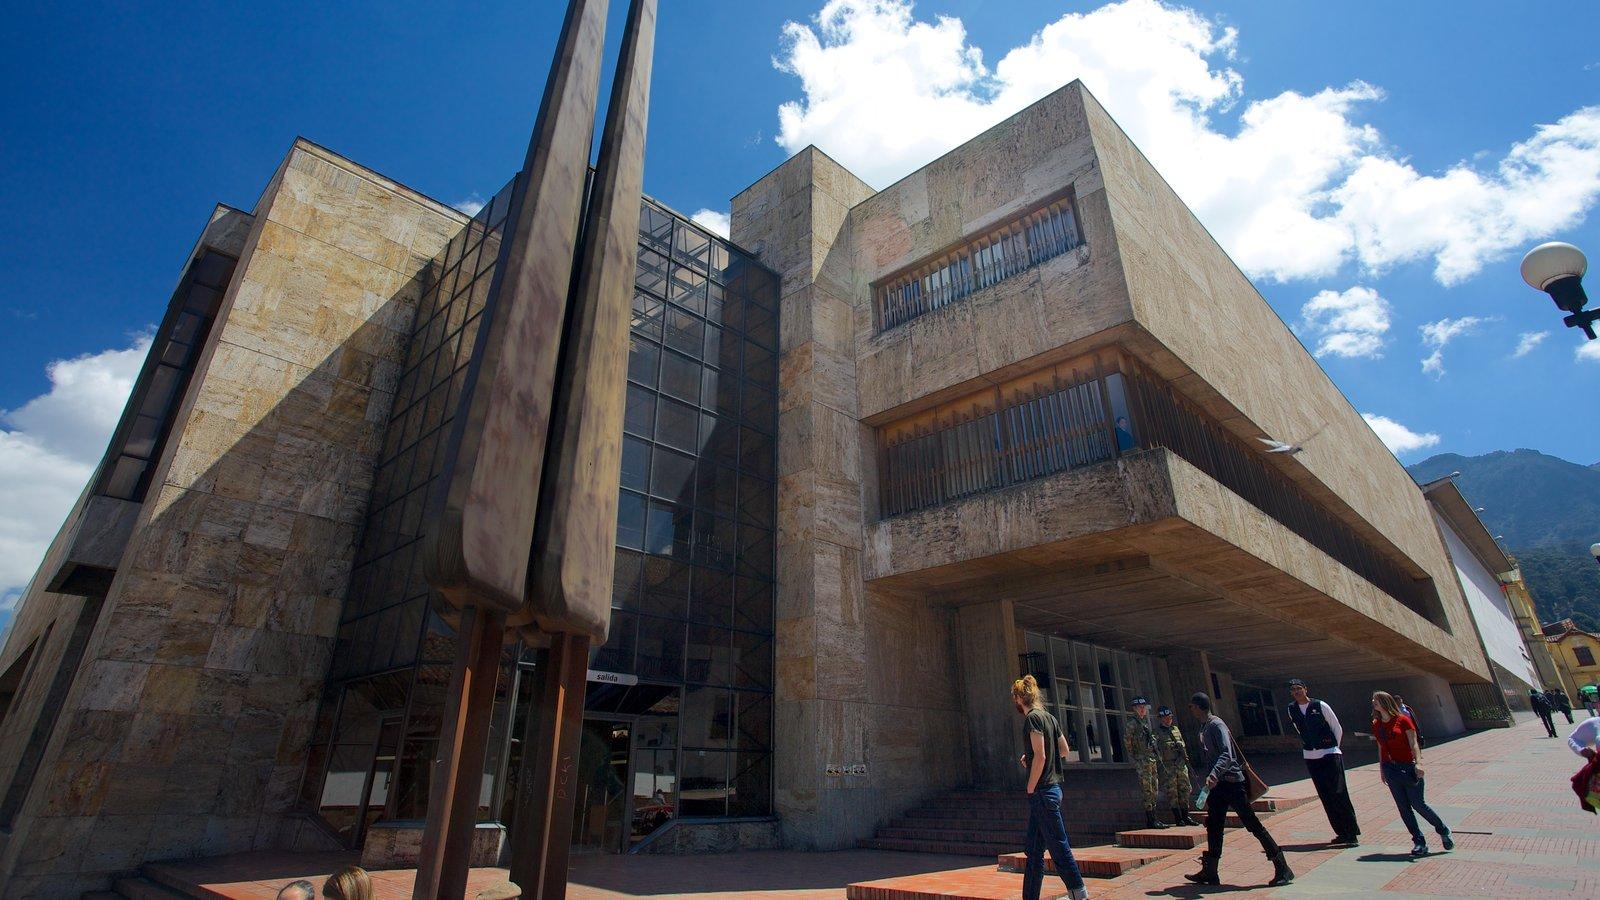 Fotos de arquitectura moderna ver im genes de colombia for Arquitectura moderna en colombia